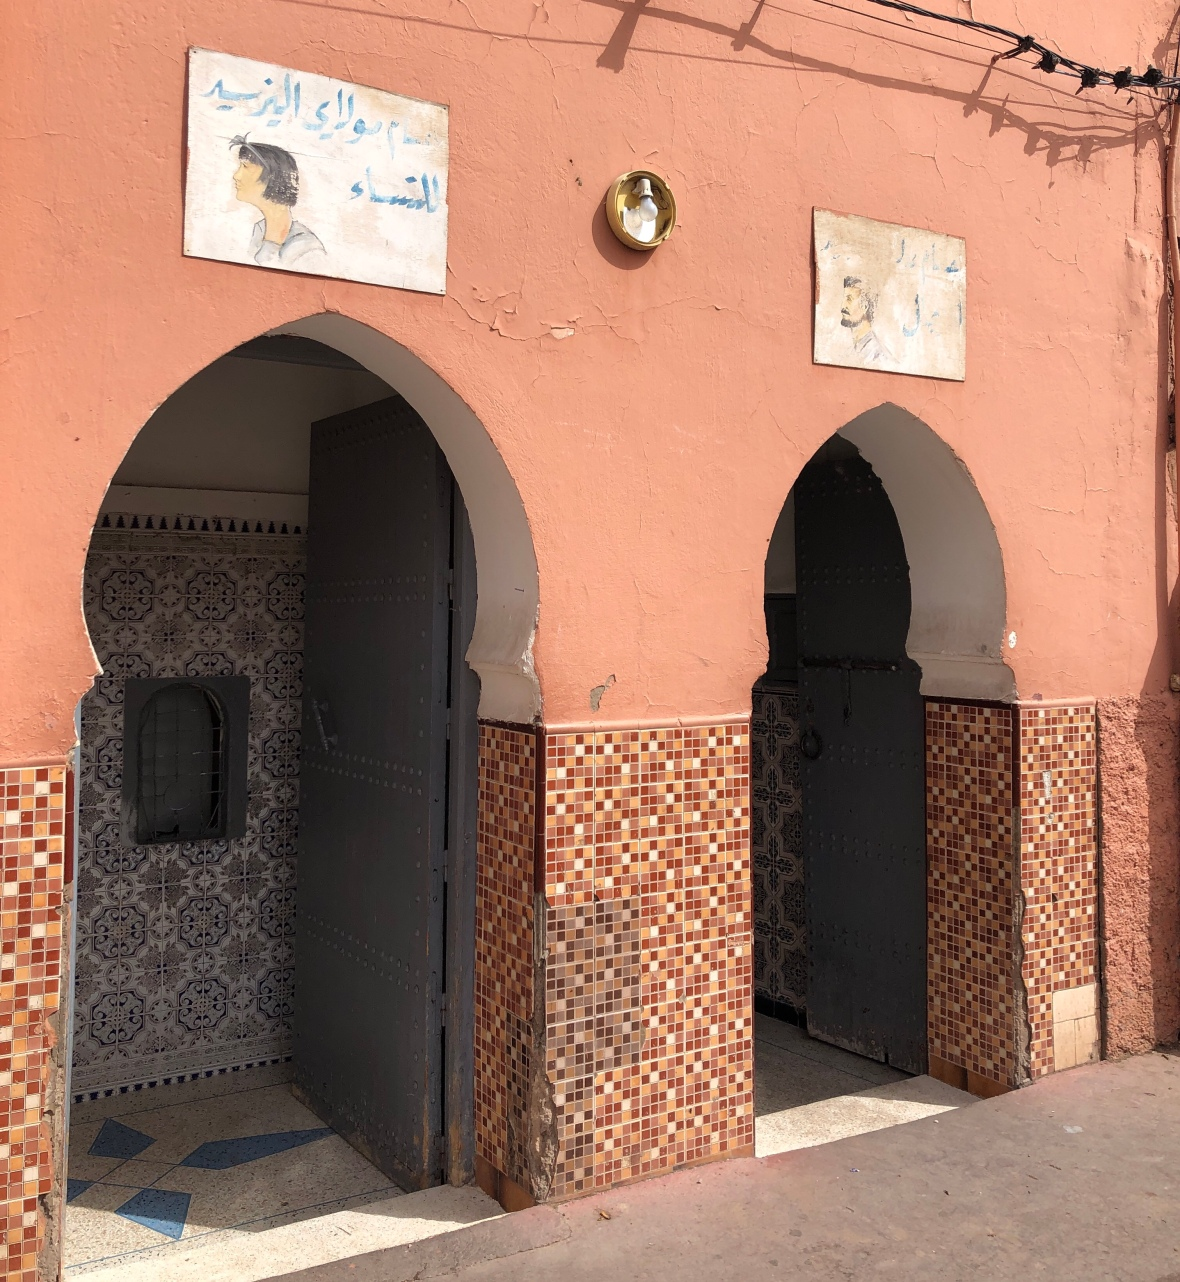 Entrada de un Hammam tradicional